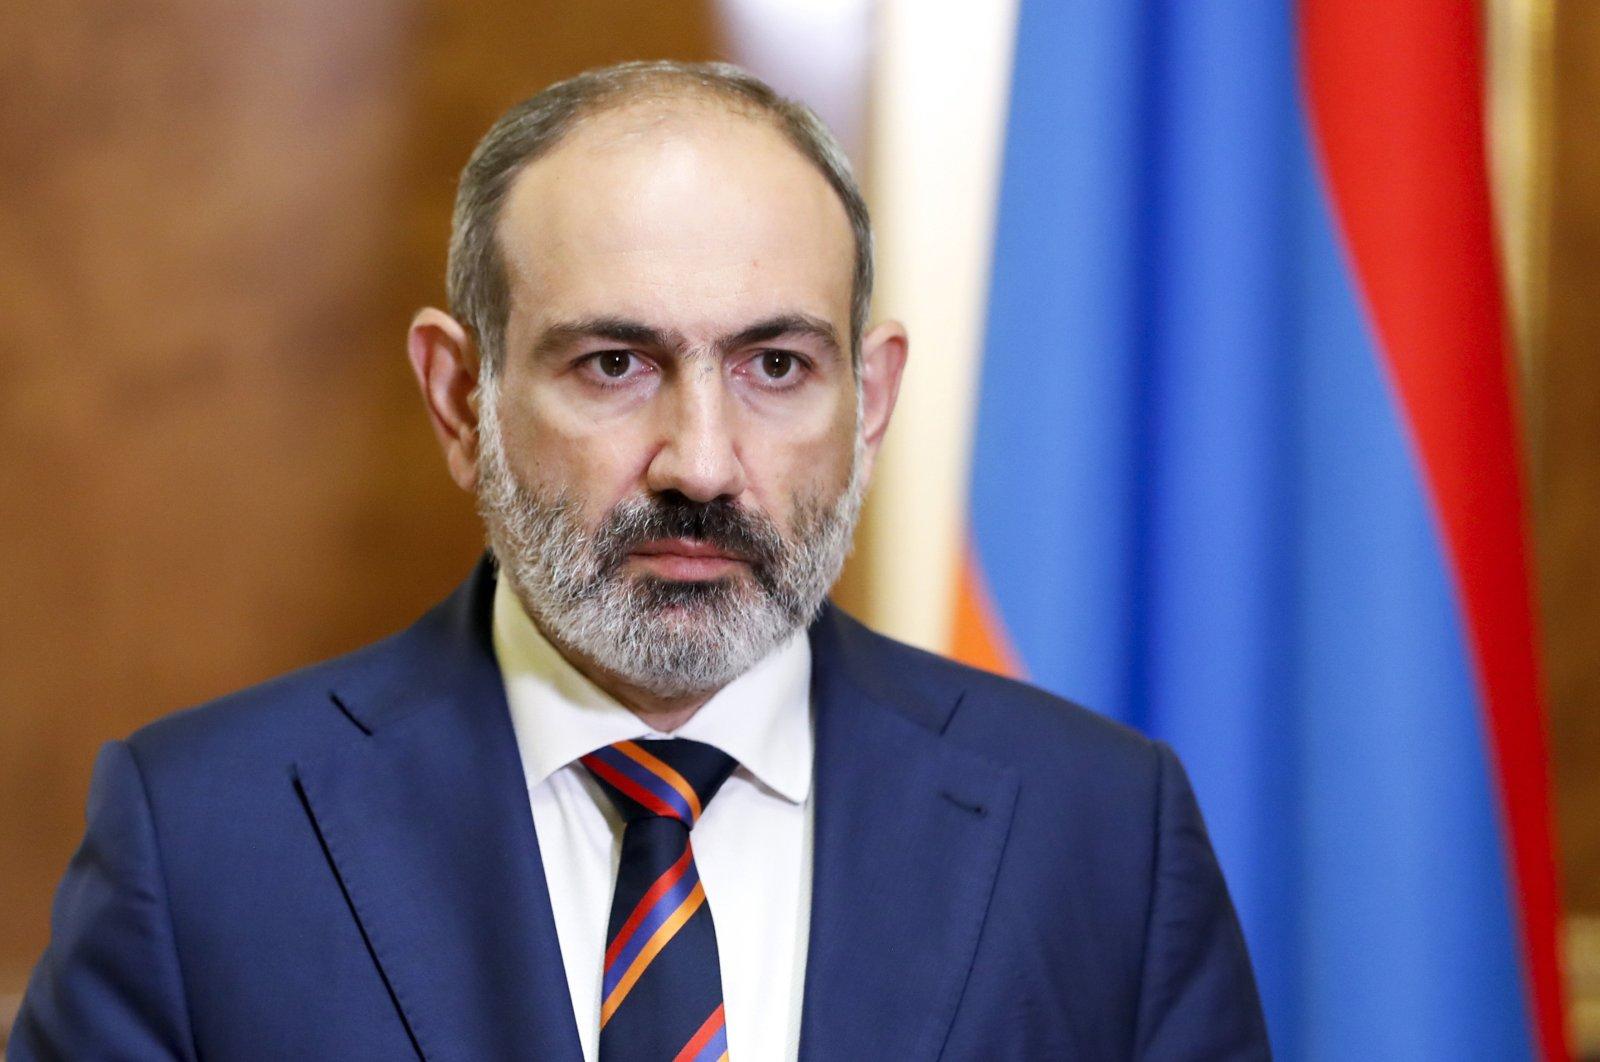 Armenian Prime Minister Nikol Pashinian pauses as he speaks at the Armenian Parliament in Yerevan, Armenia, Sunday, Sept. 27, 2020. (AP Photo)